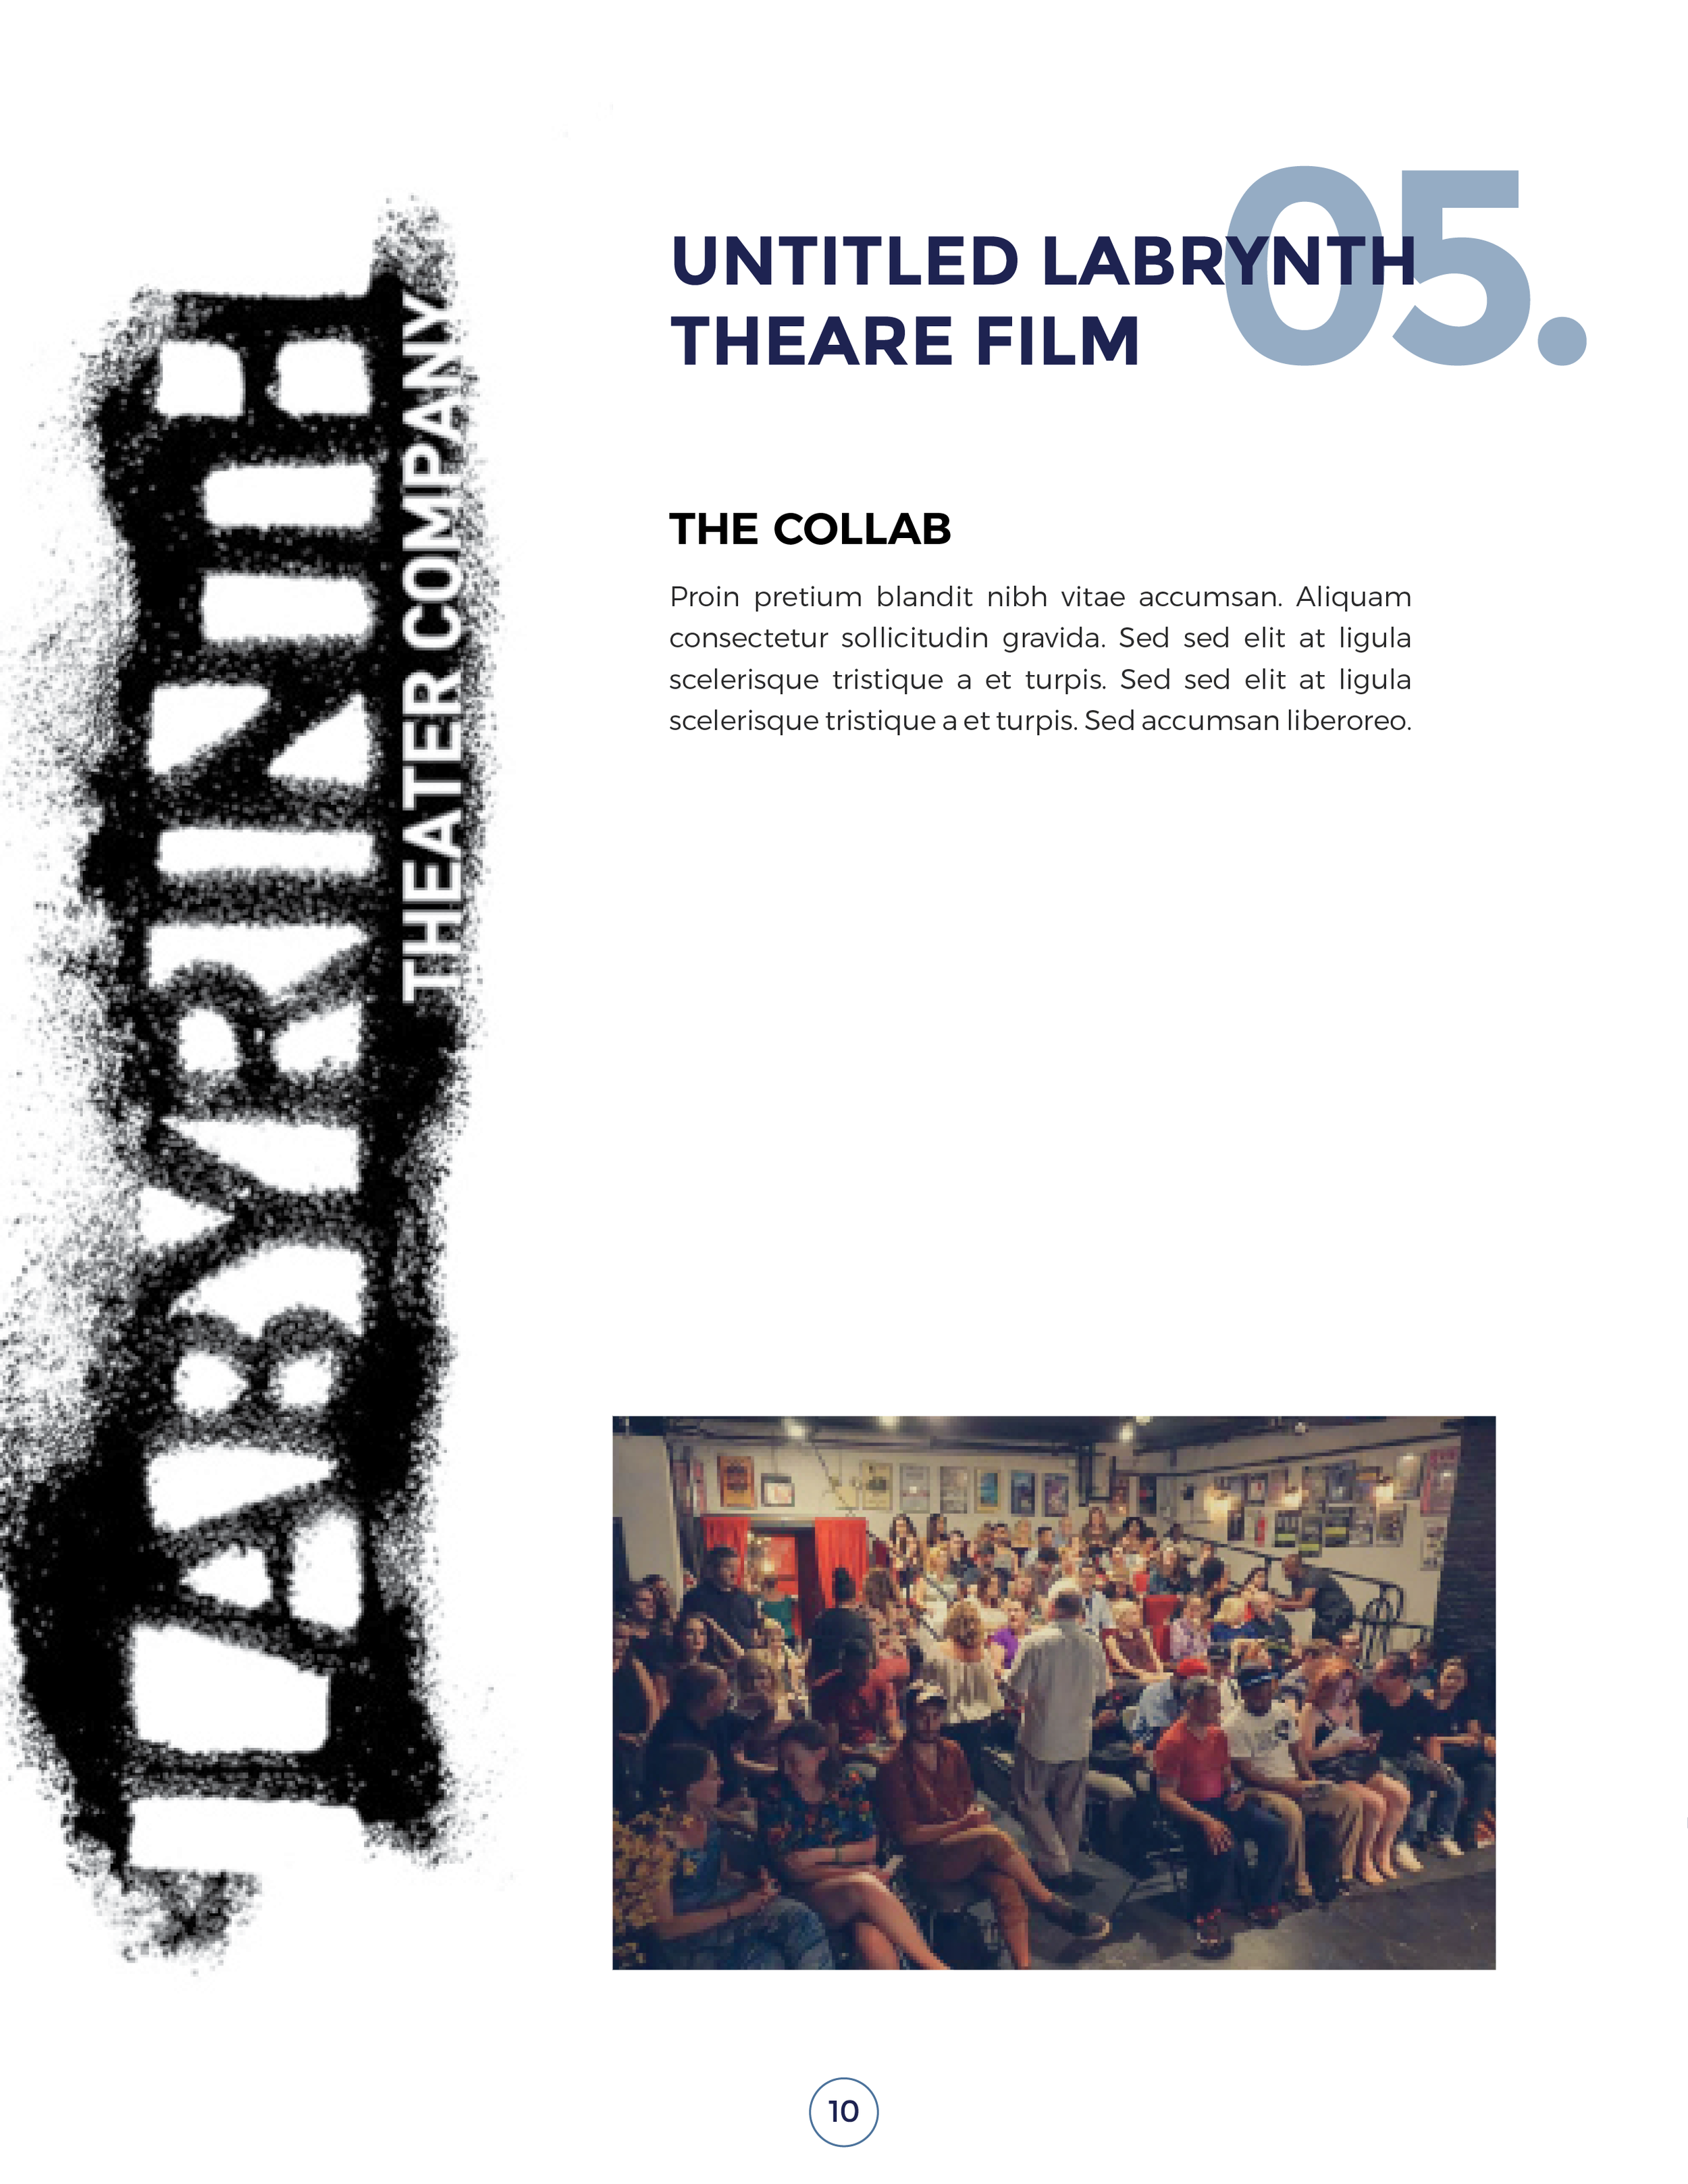 Pigasus Indiana Film Fund Deck10.png